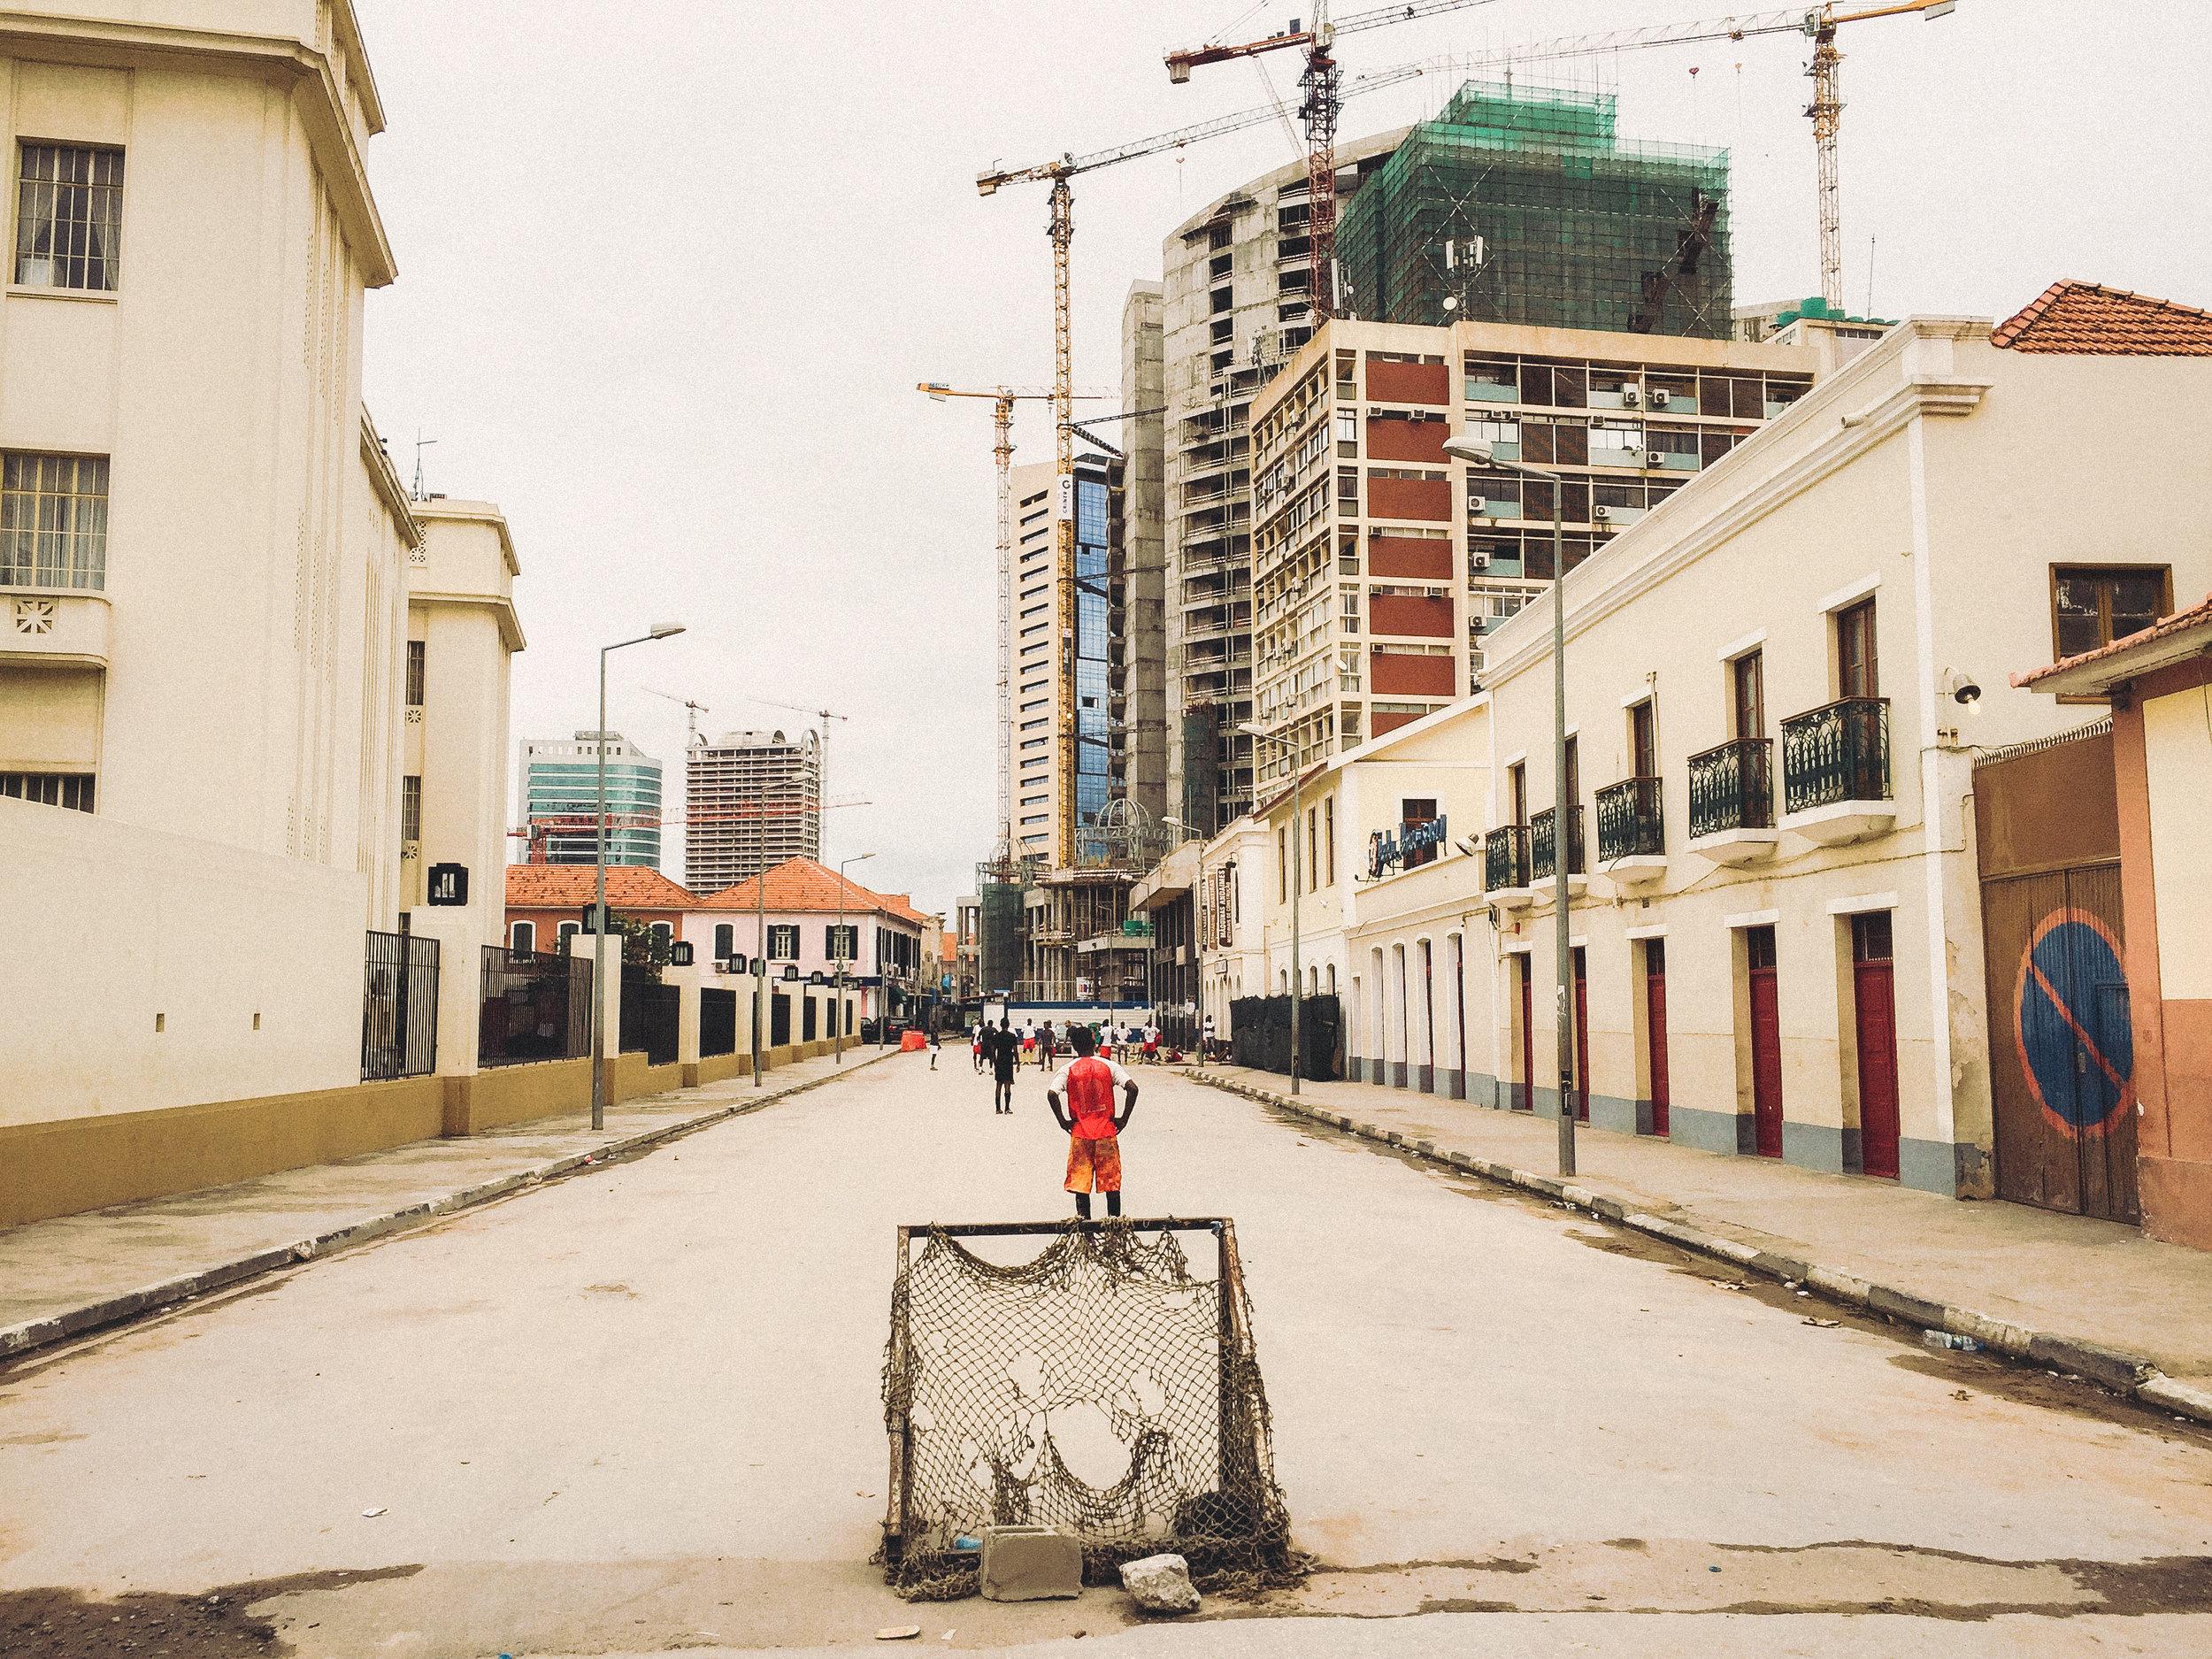 Angola Soccer by Mel D. Cole 2015-14.jpg